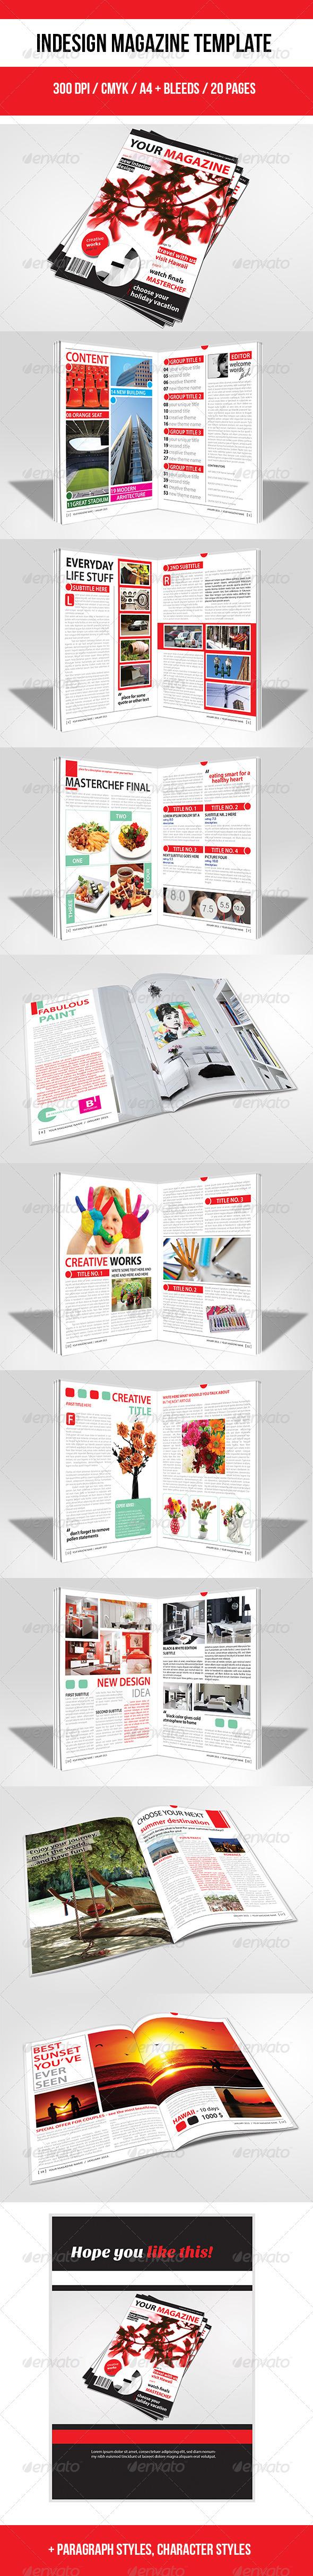 GraphicRiver Indesign Magazine Template 3756335